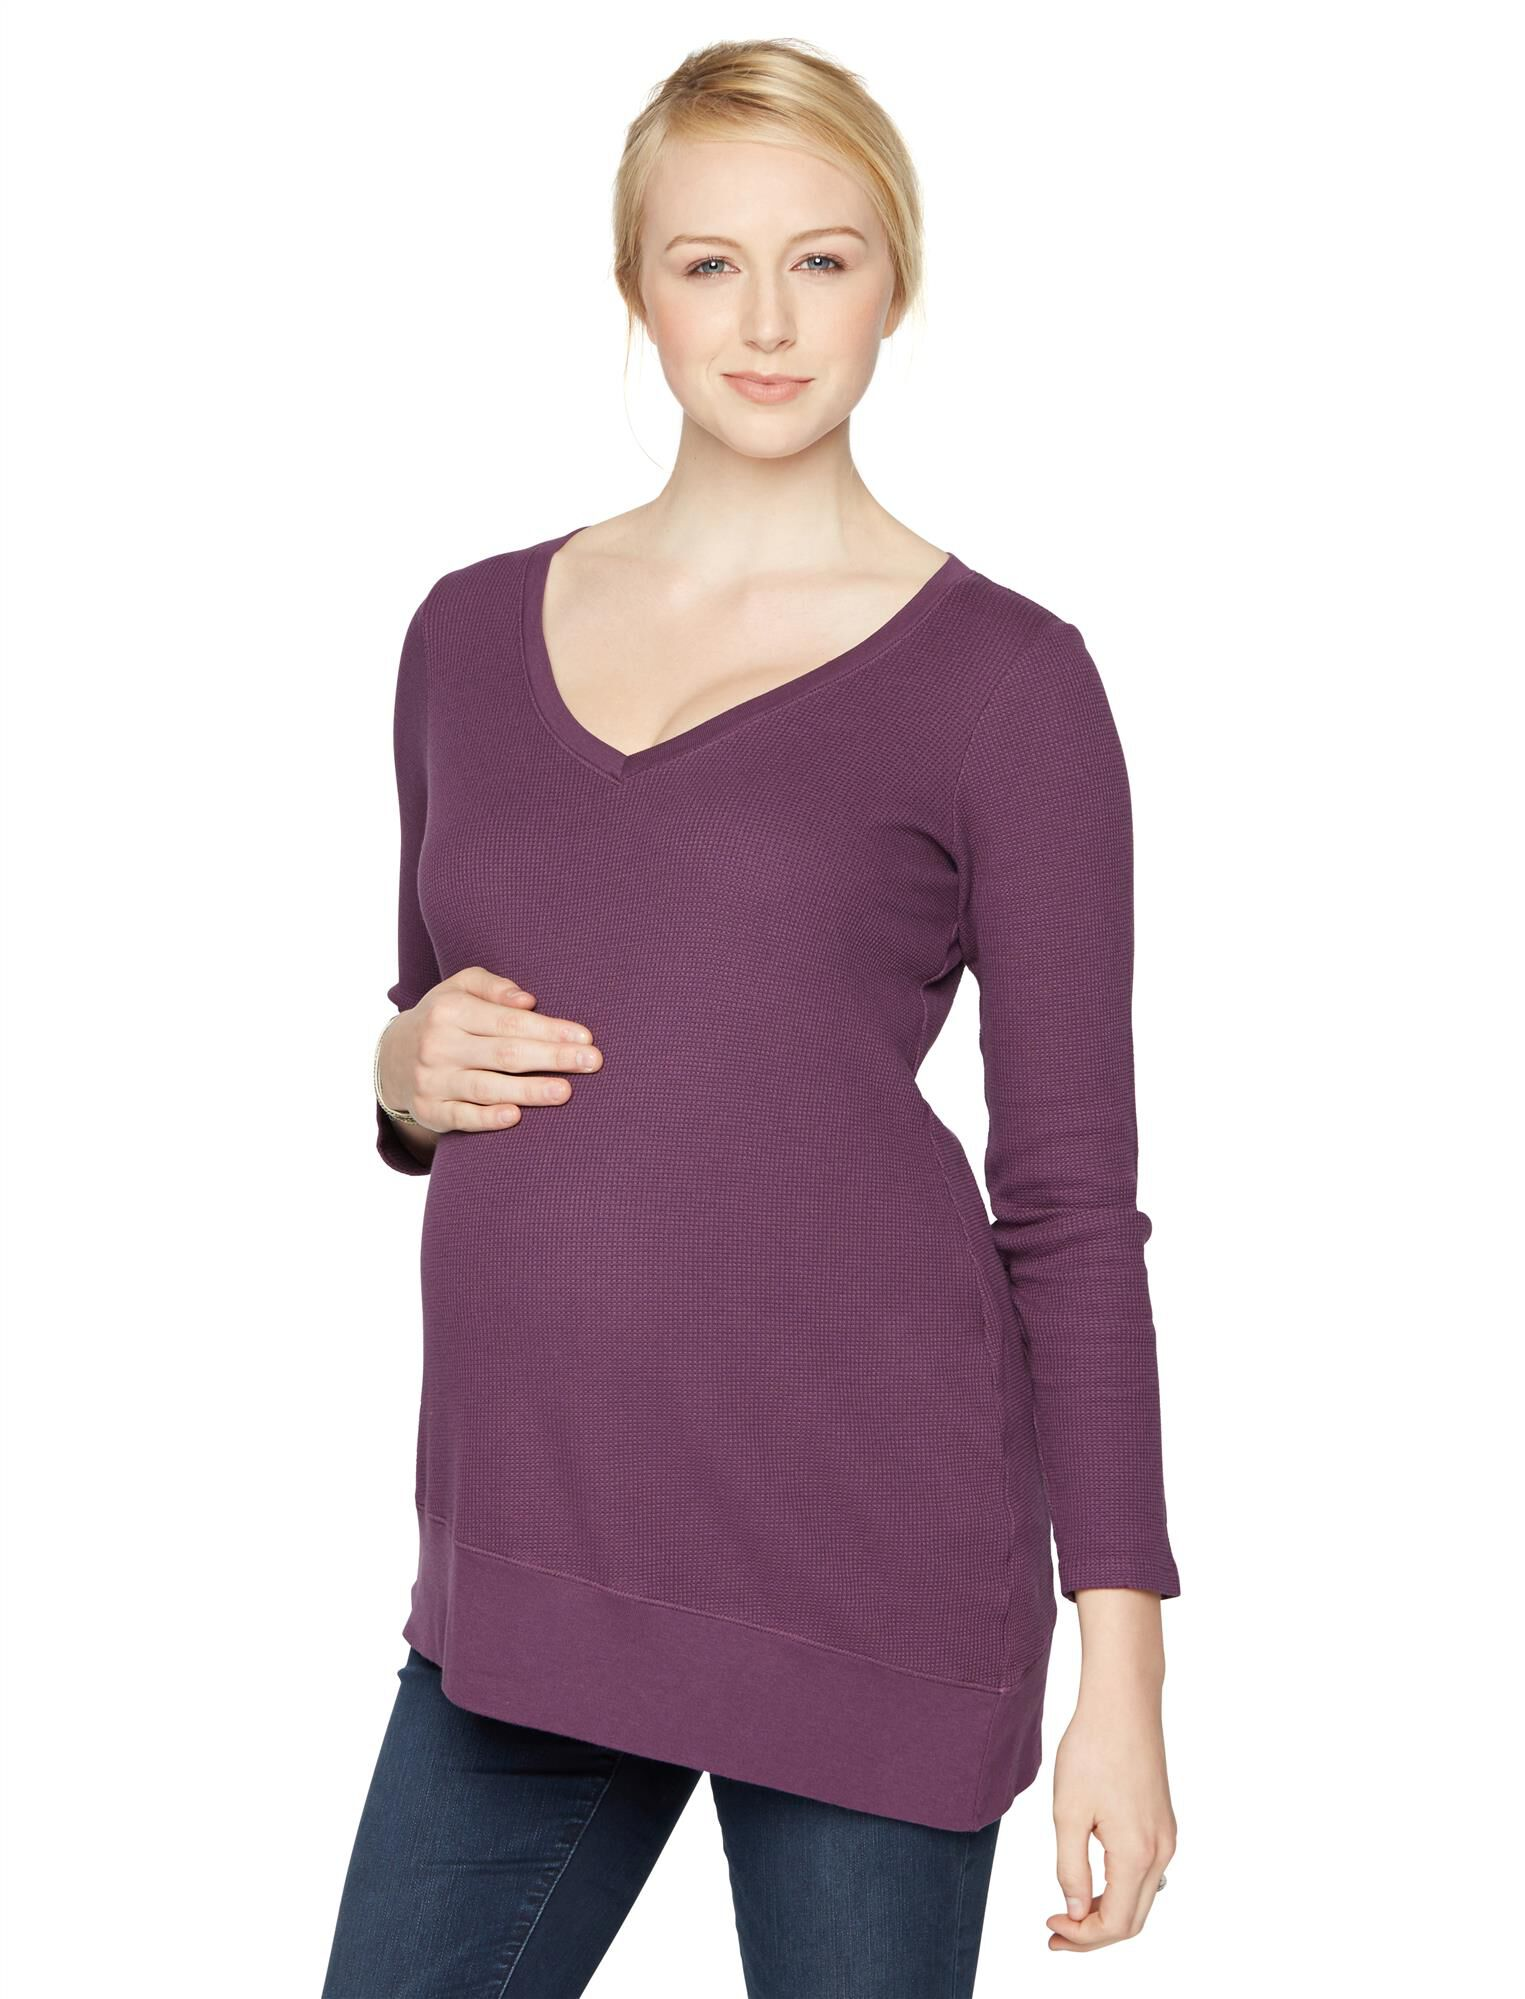 Splendid Maternity T Shirt